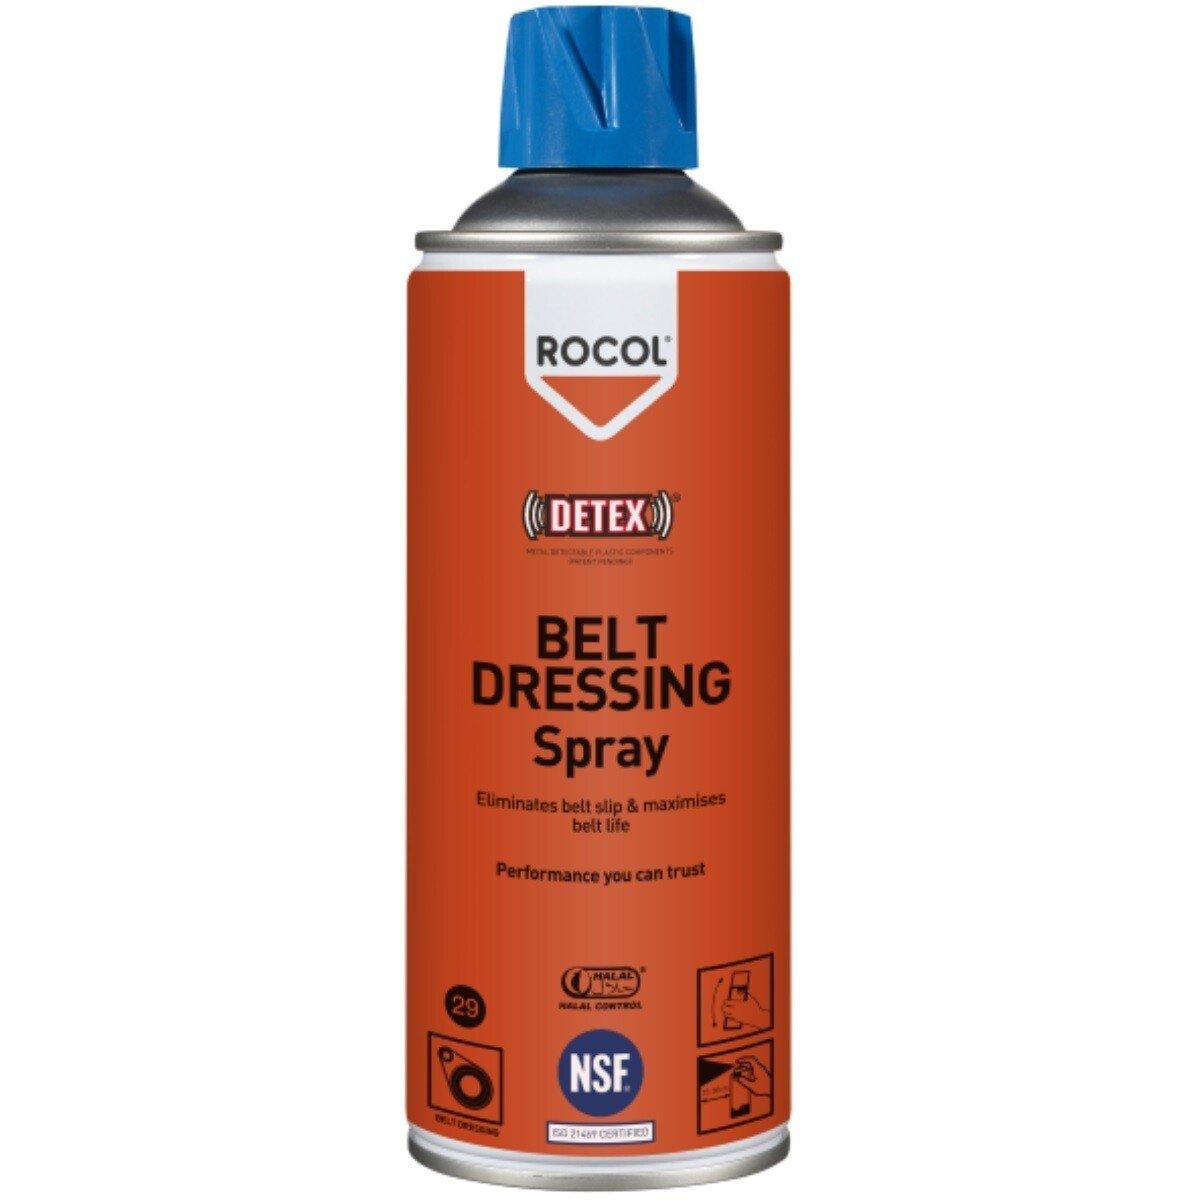 Rocol 34295 Belt Dressing Spray (NSF Registered) 300ml